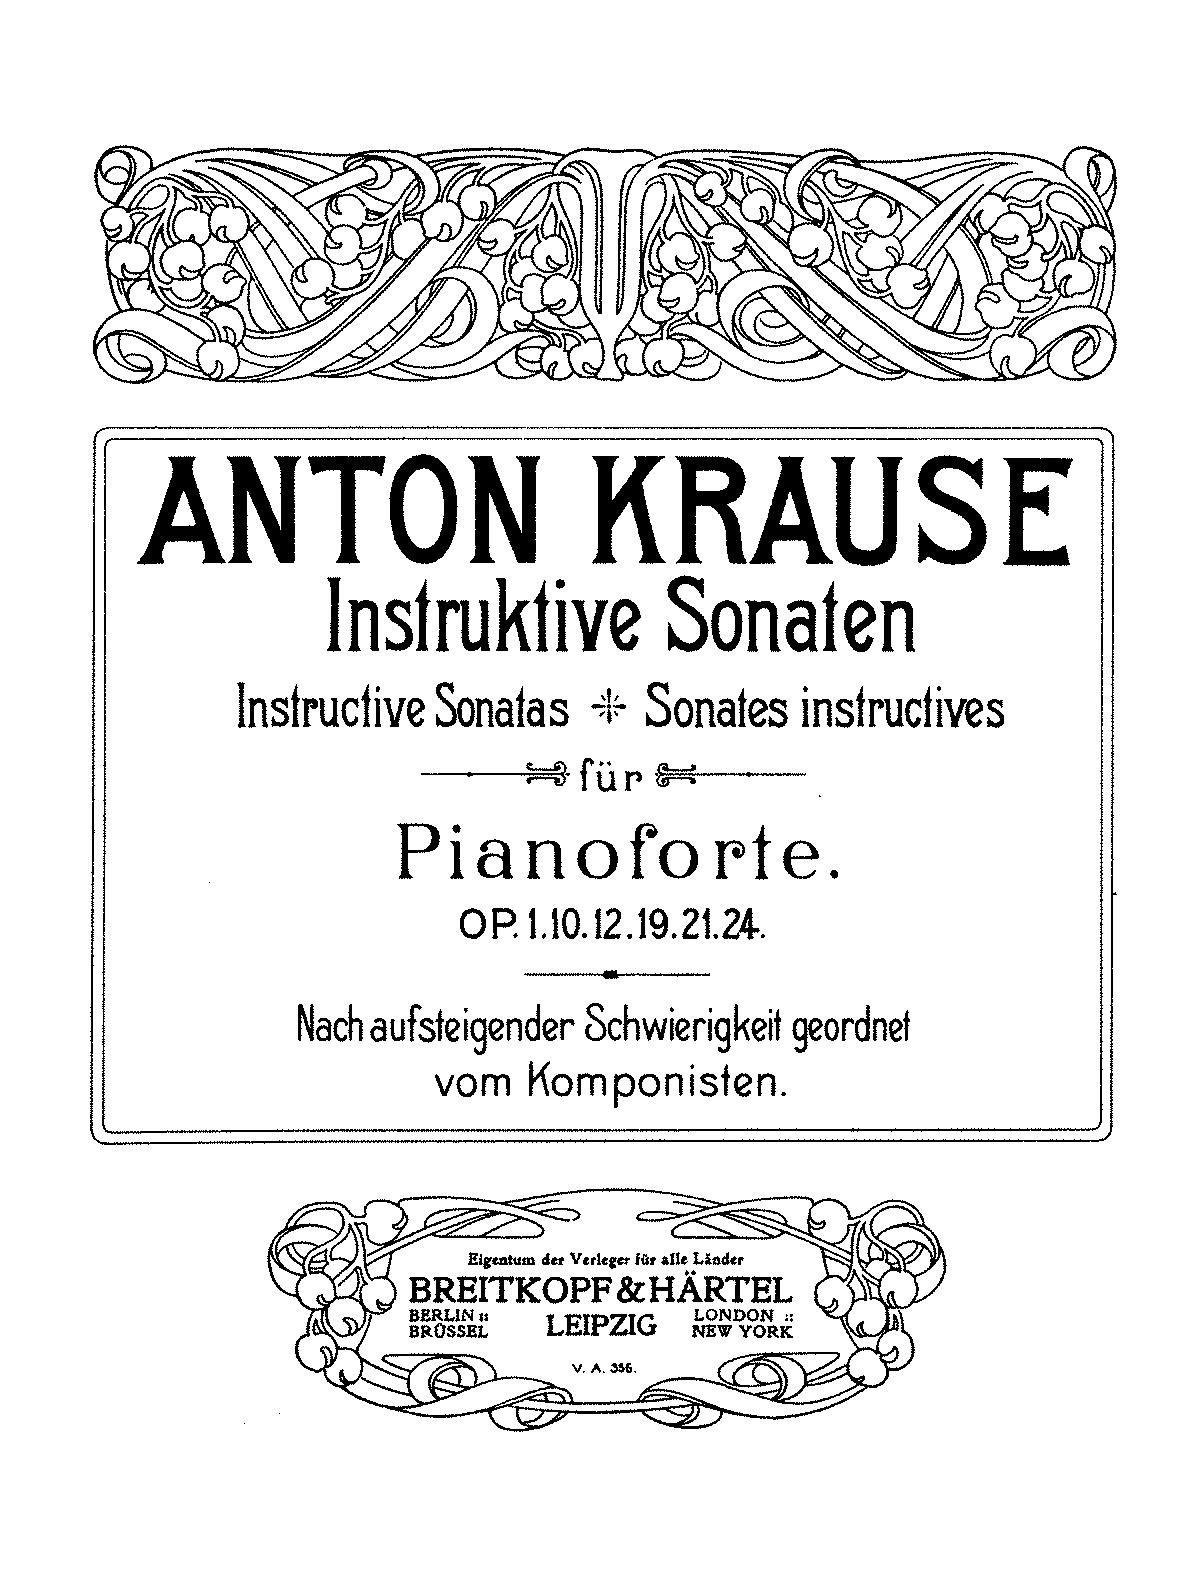 2 instructive Sonaten, Op 21 (Krause, Anton) - IMSLP/Petrucci Music